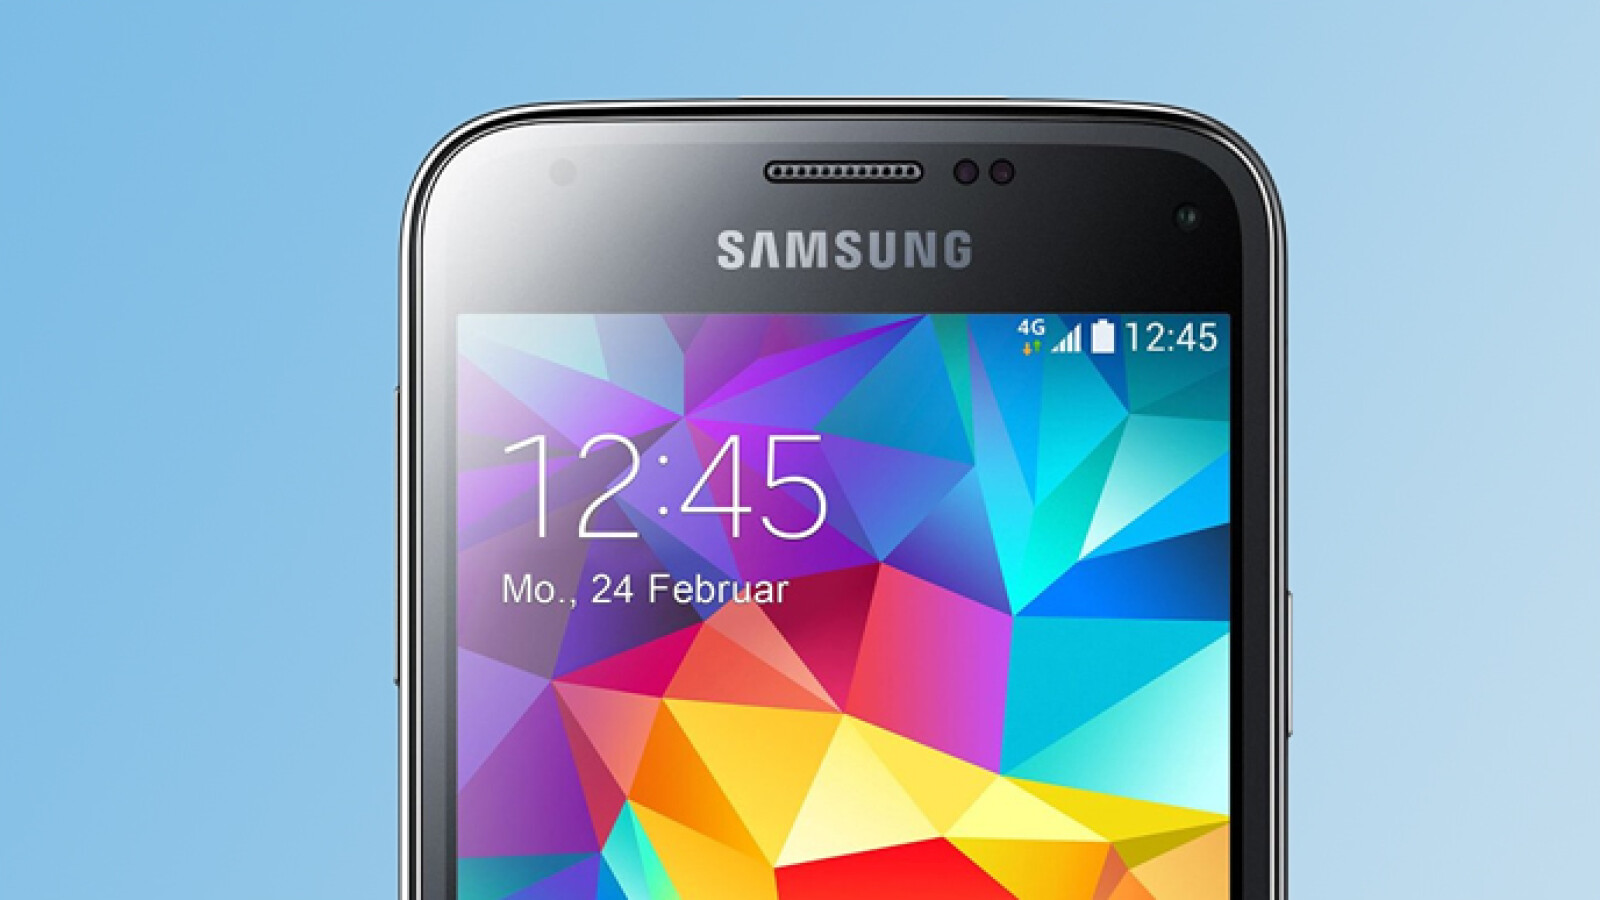 Samsung Galaxy S5 Mini Wann